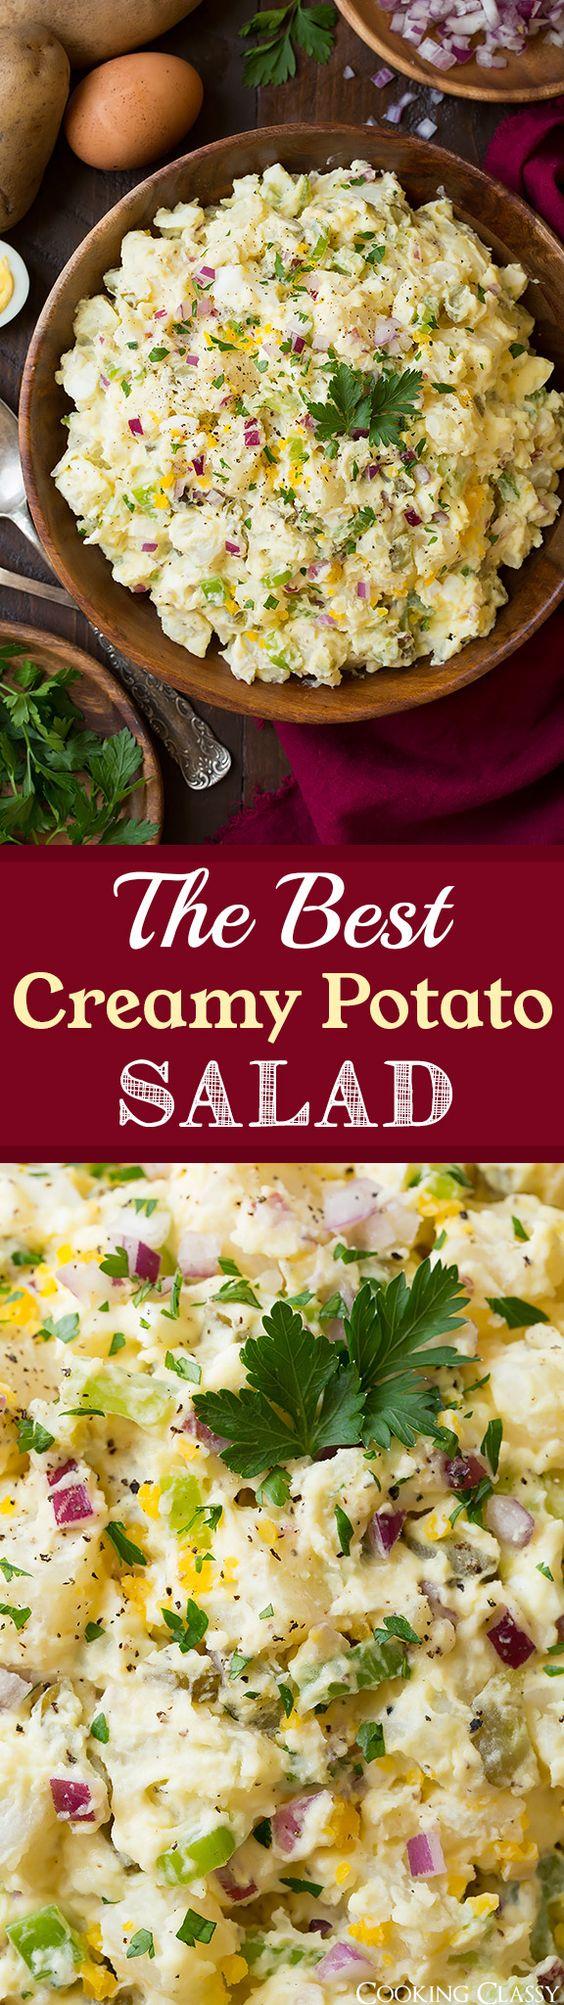 more potato salad classic potatoes salads classic potato salad for the ...